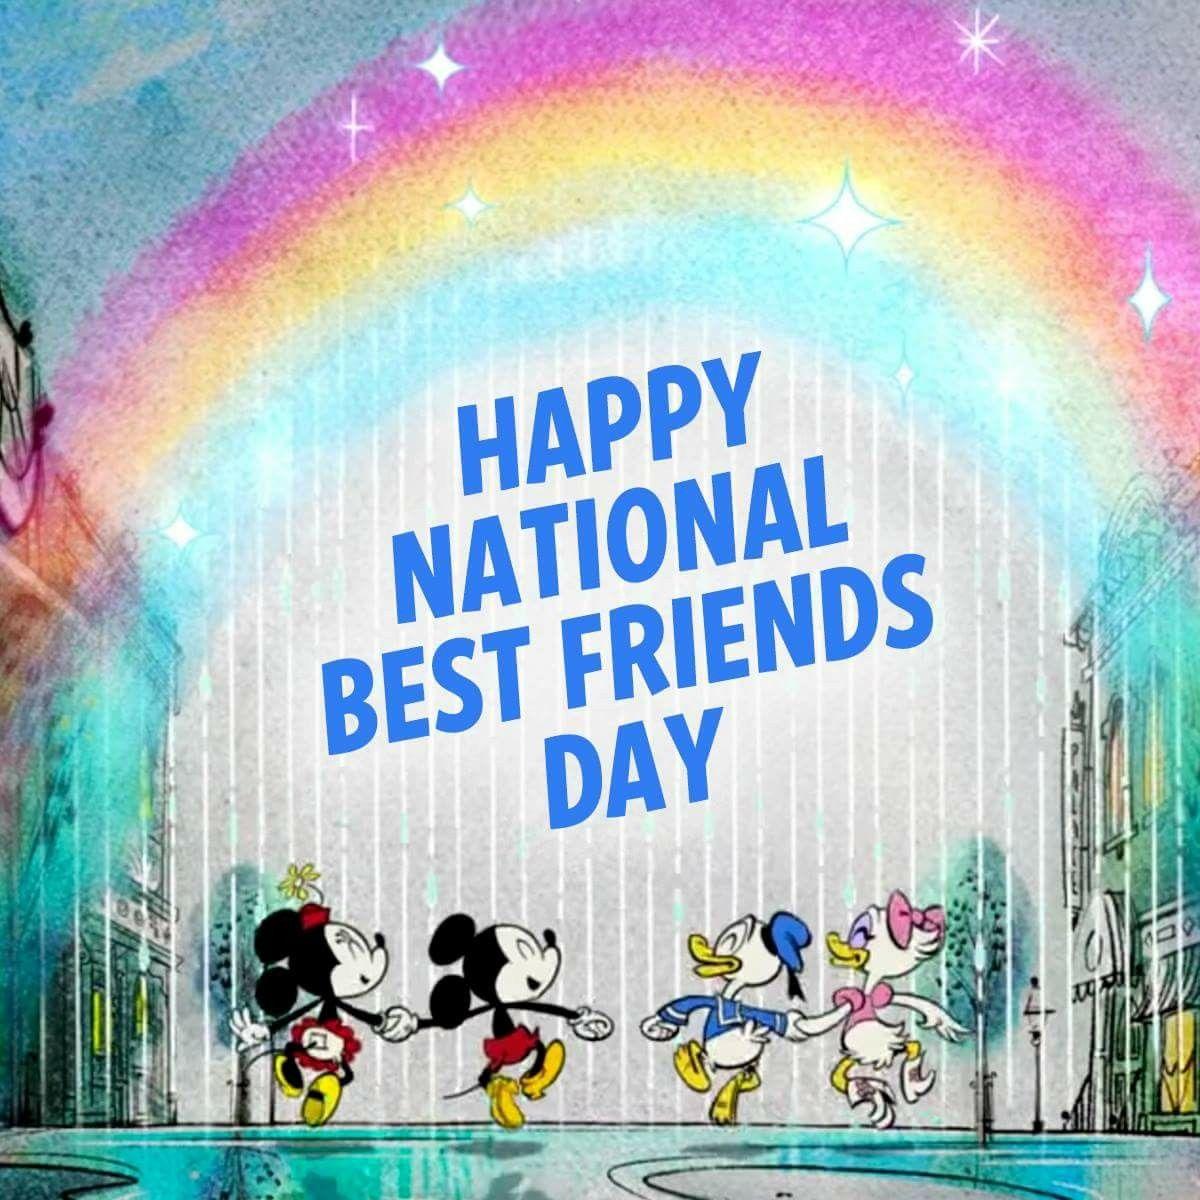 Happy National Best Friends Day National Best Friend Day Best